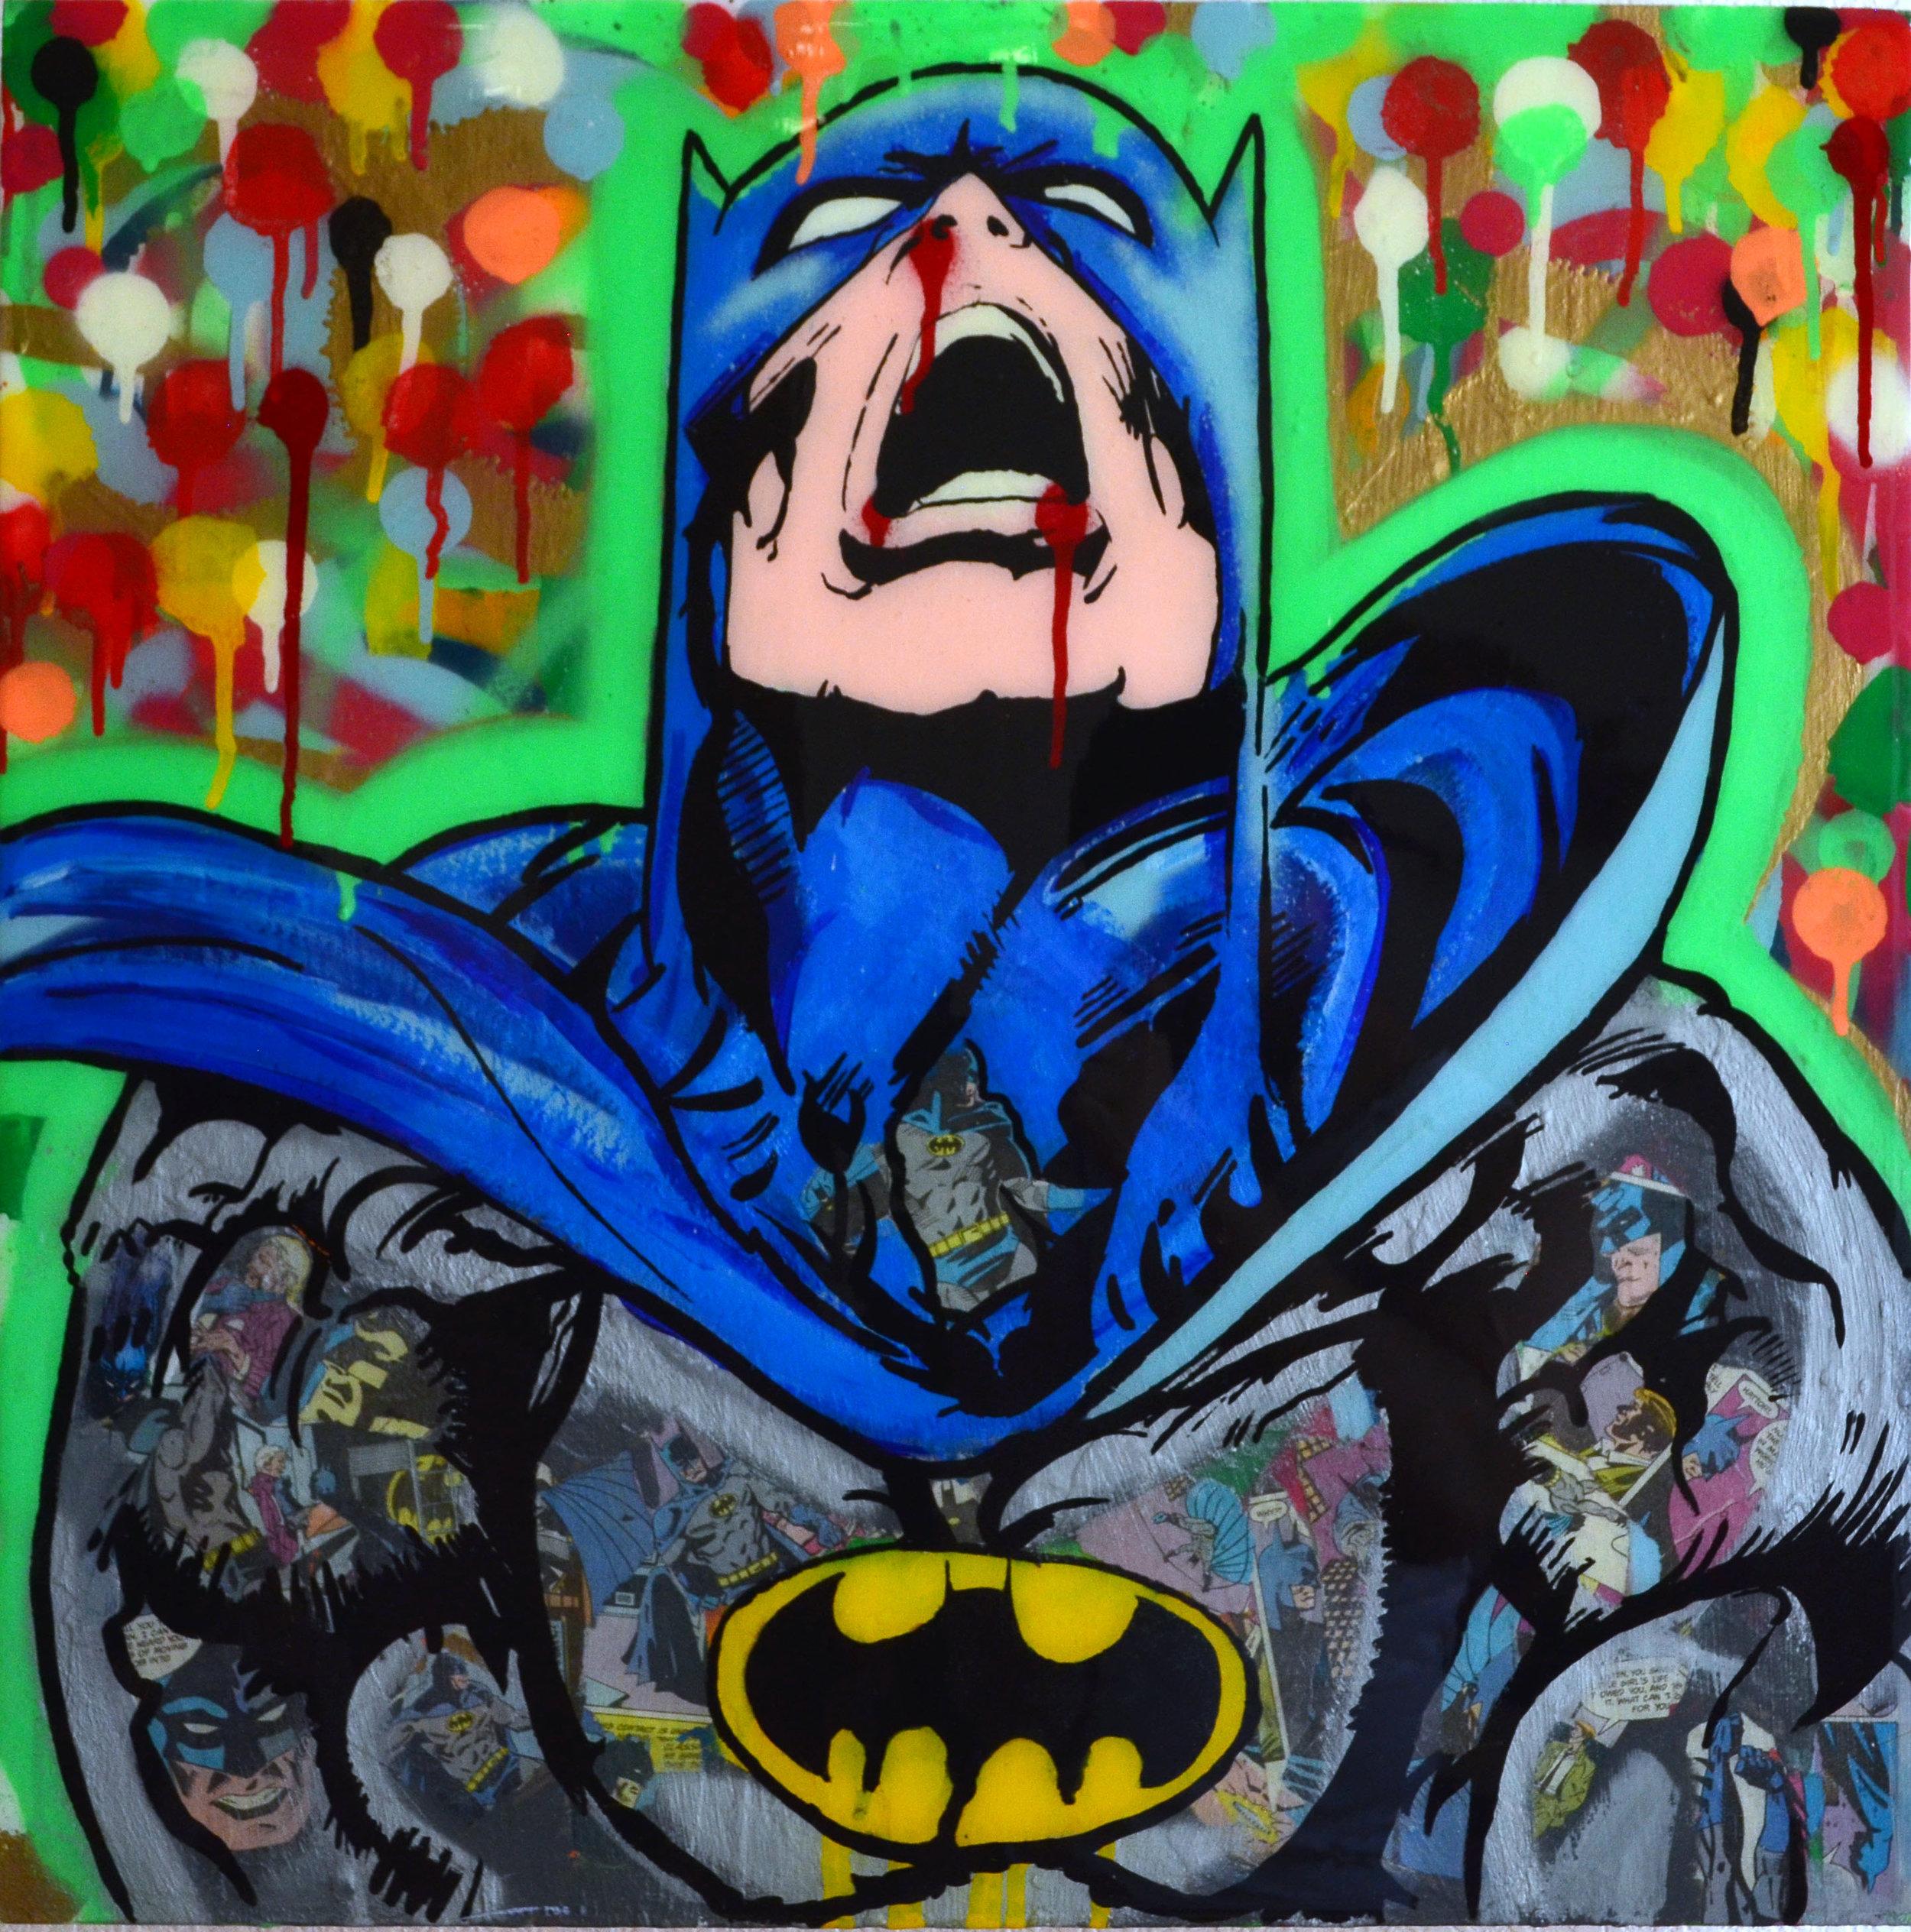 Cisco Lopez Jr Art_Cisco_Batman_22inx22in_Acrylic On Wood Panel Canvas_Edition 1of1_2018_$1150.jpg